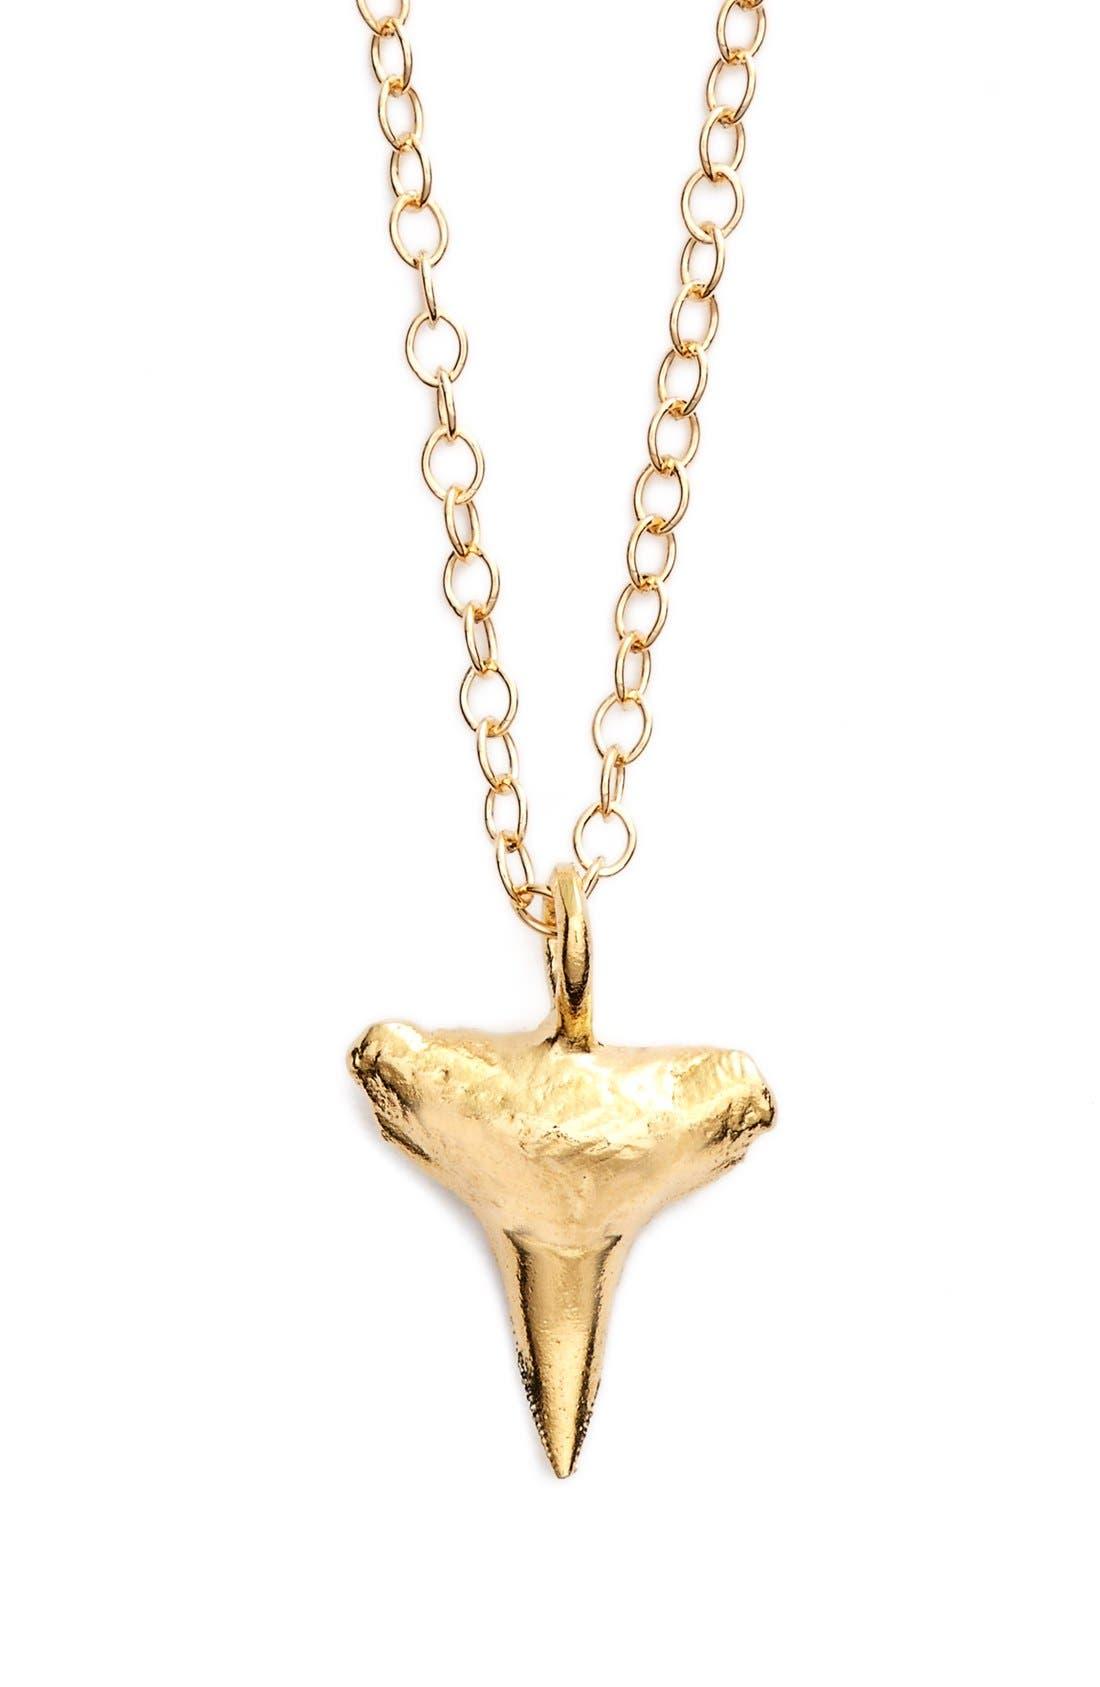 Main Image - ki-ele 'Manini Mano' Shark's Tooth Pendant Necklace